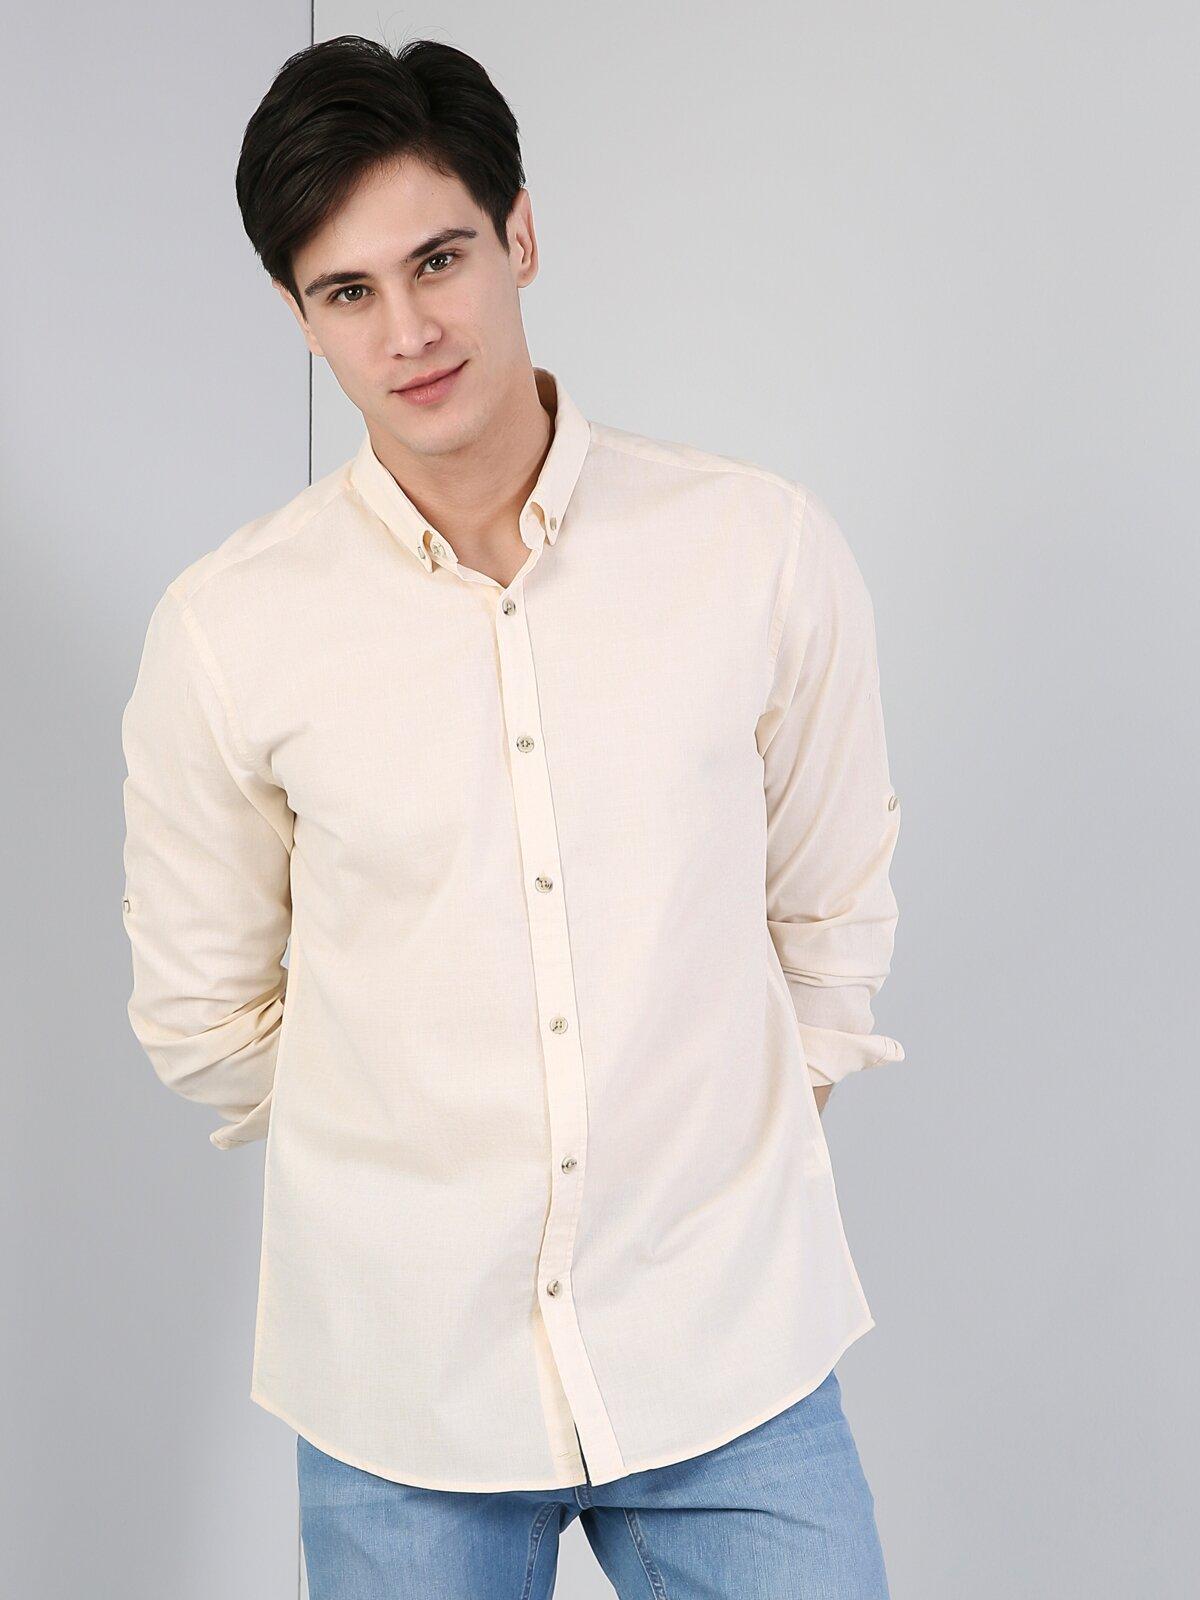 Regular Fit Shirt Neck Erkek Sarı Uzun Kol Gömlek